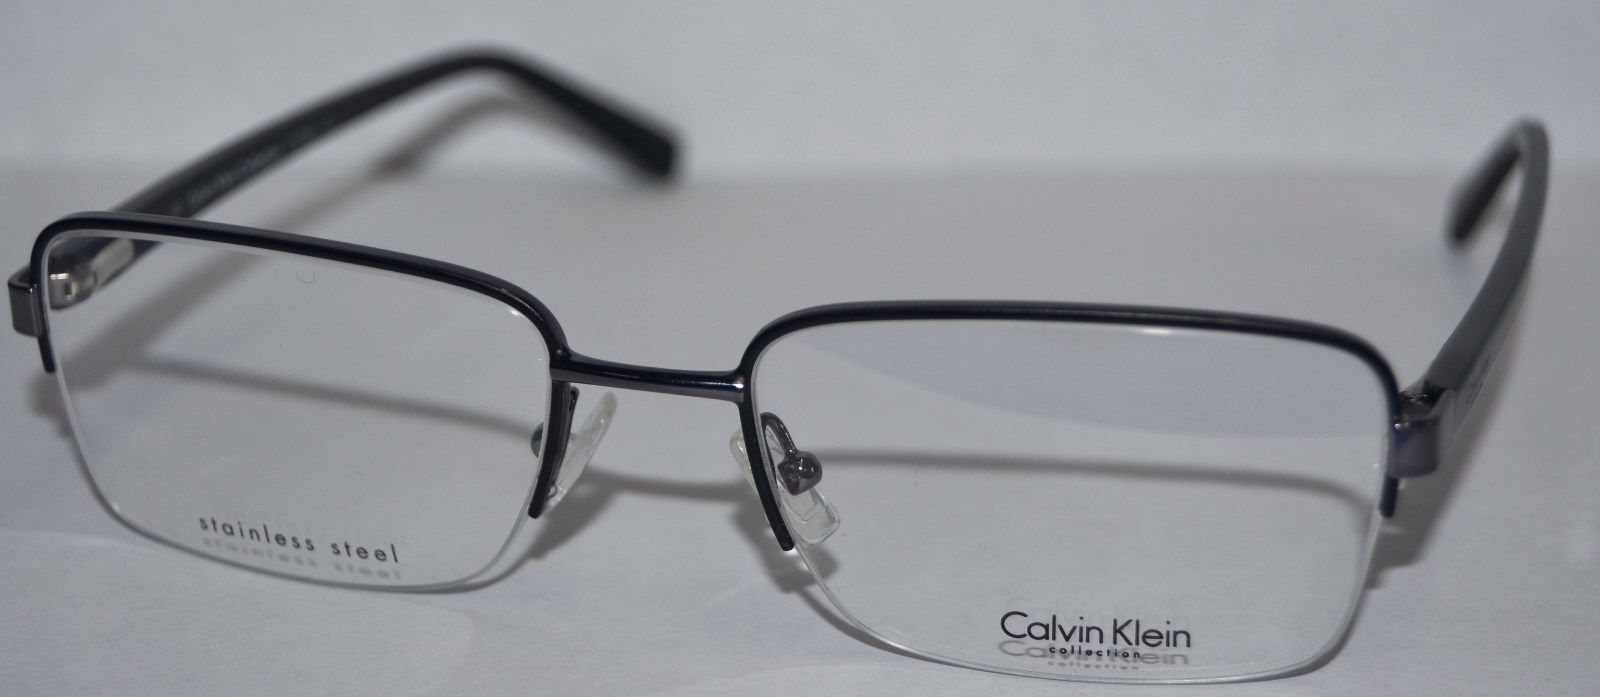 cd95bec979a Calvin Klein Frames CK7383 033